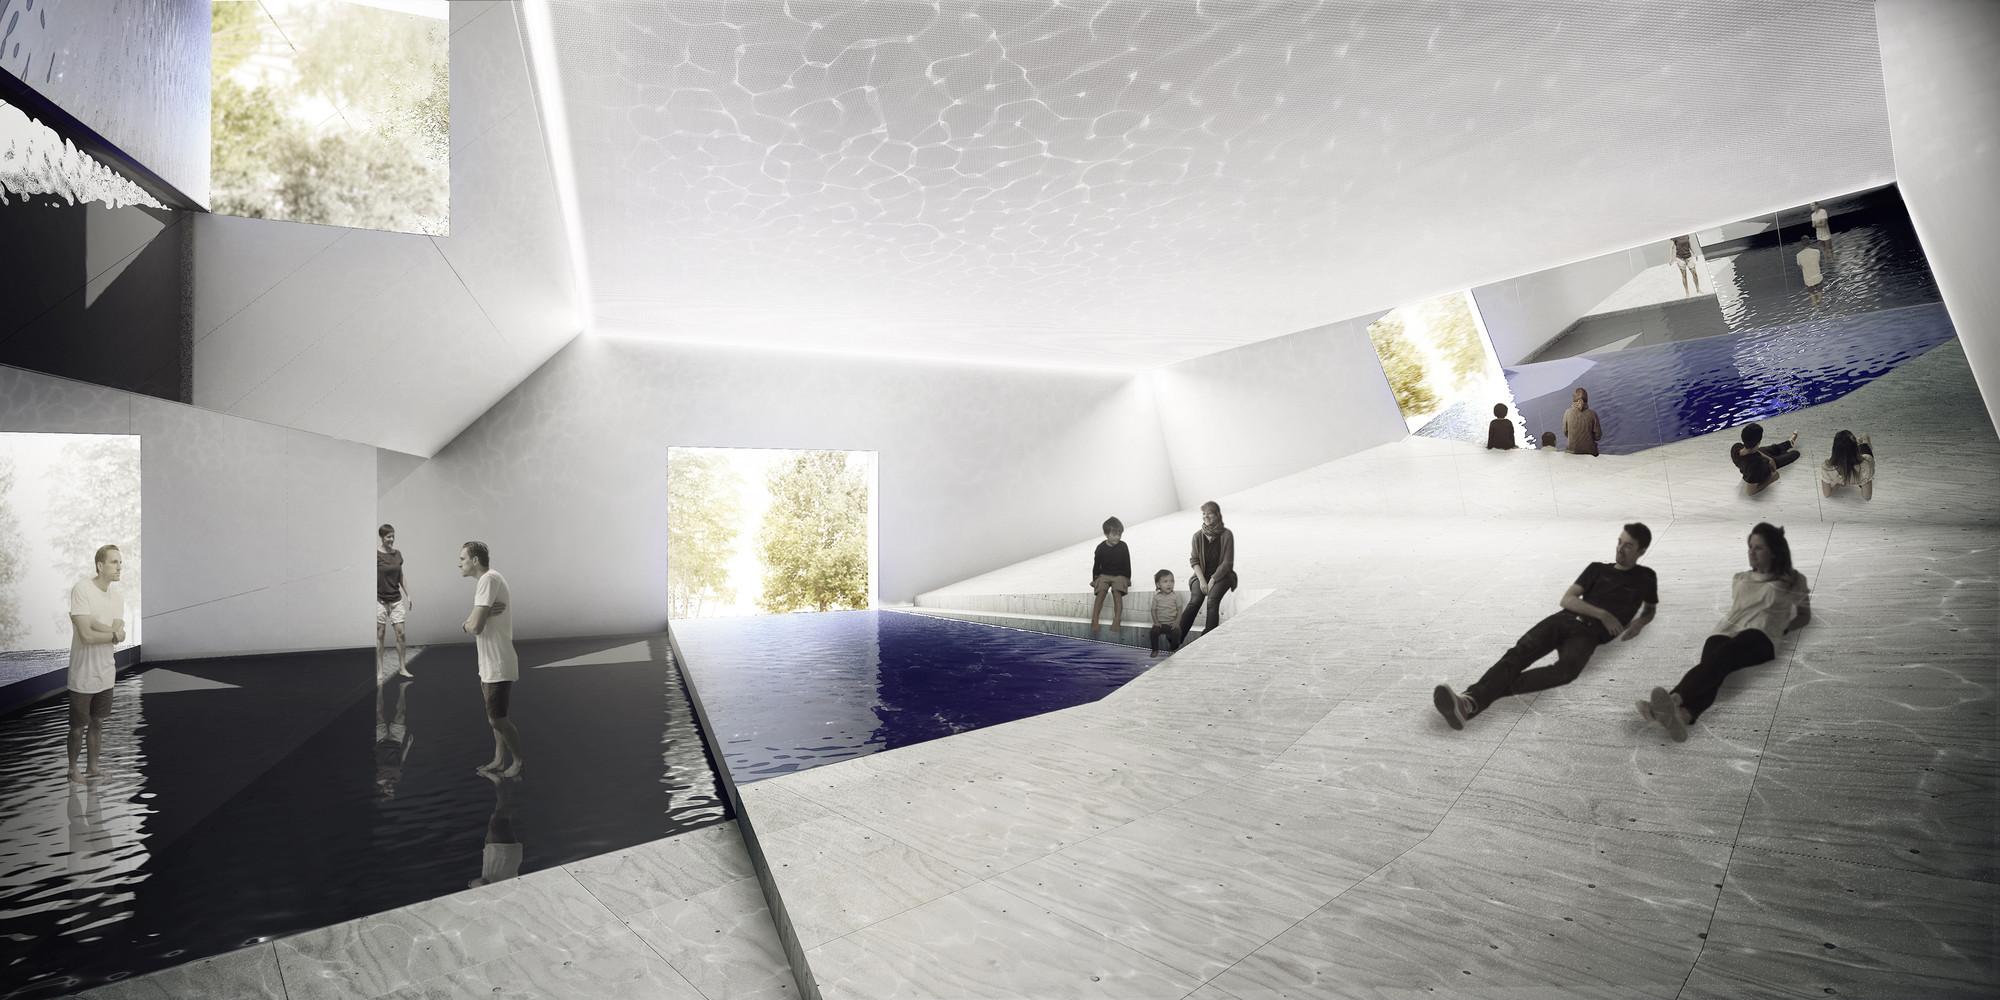 Courtesy of Australian Institute of Architects